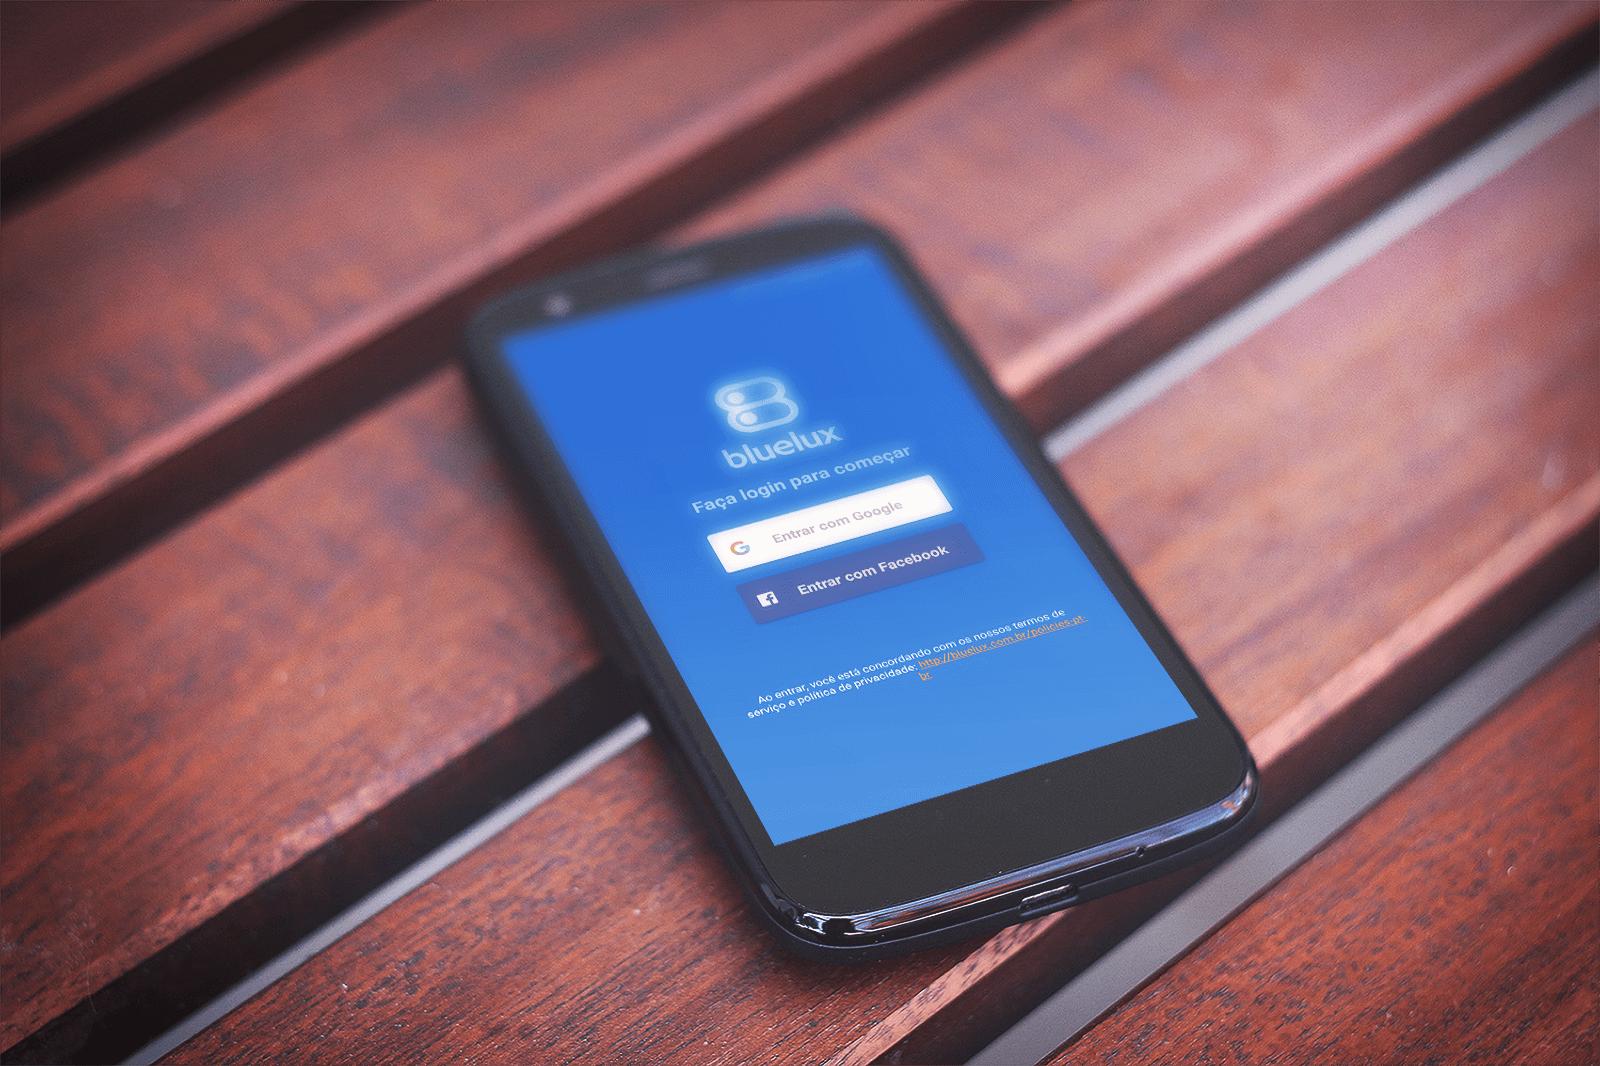 Novo app Bluelux